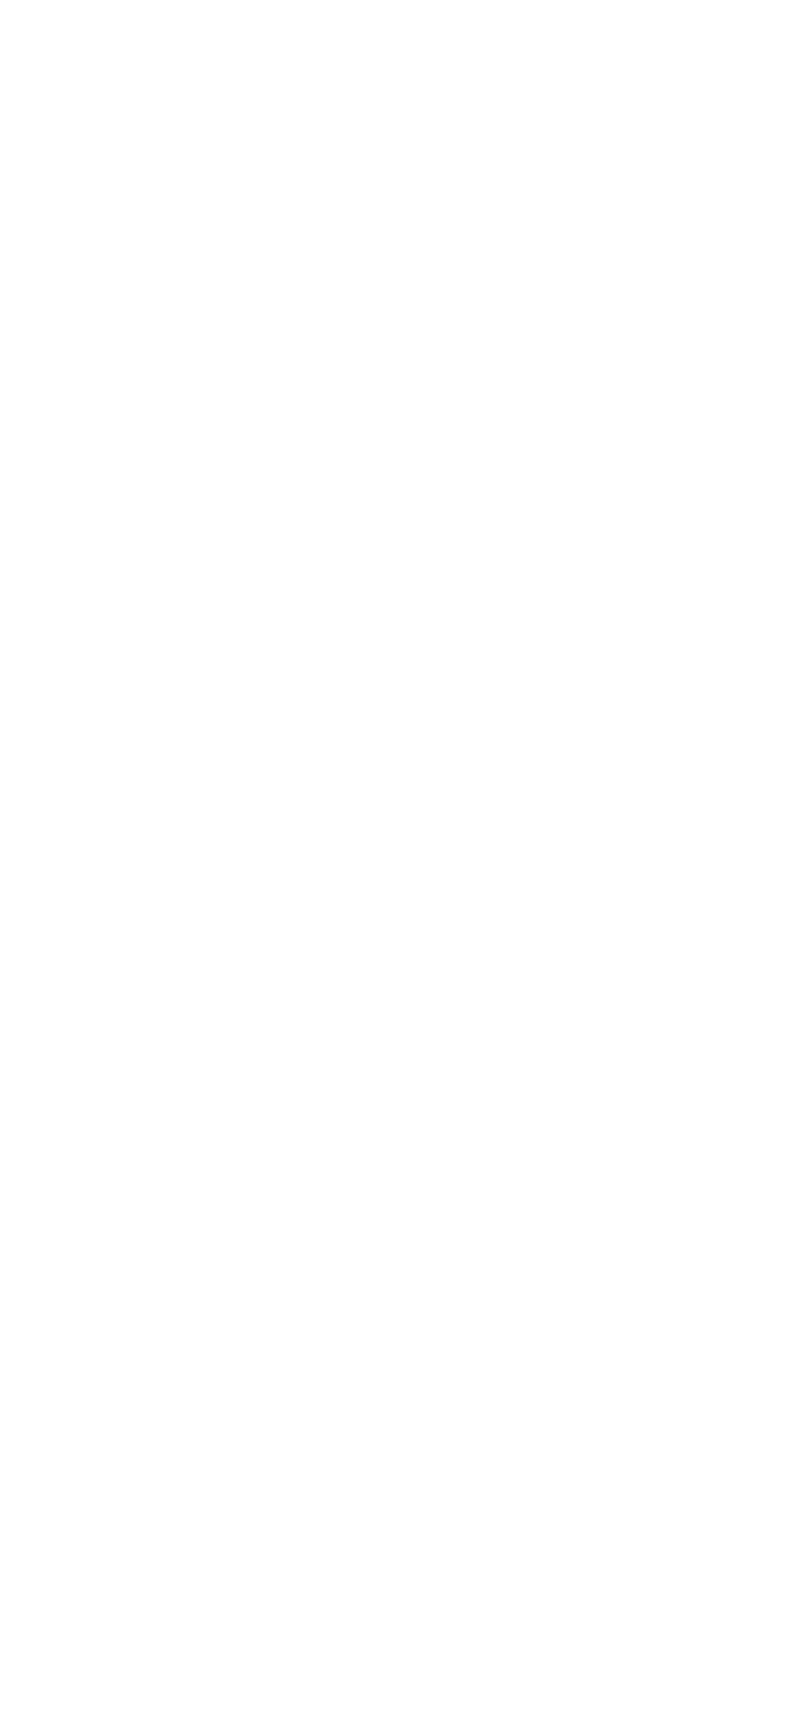 oat_primarylogo_eng_rgb_negative